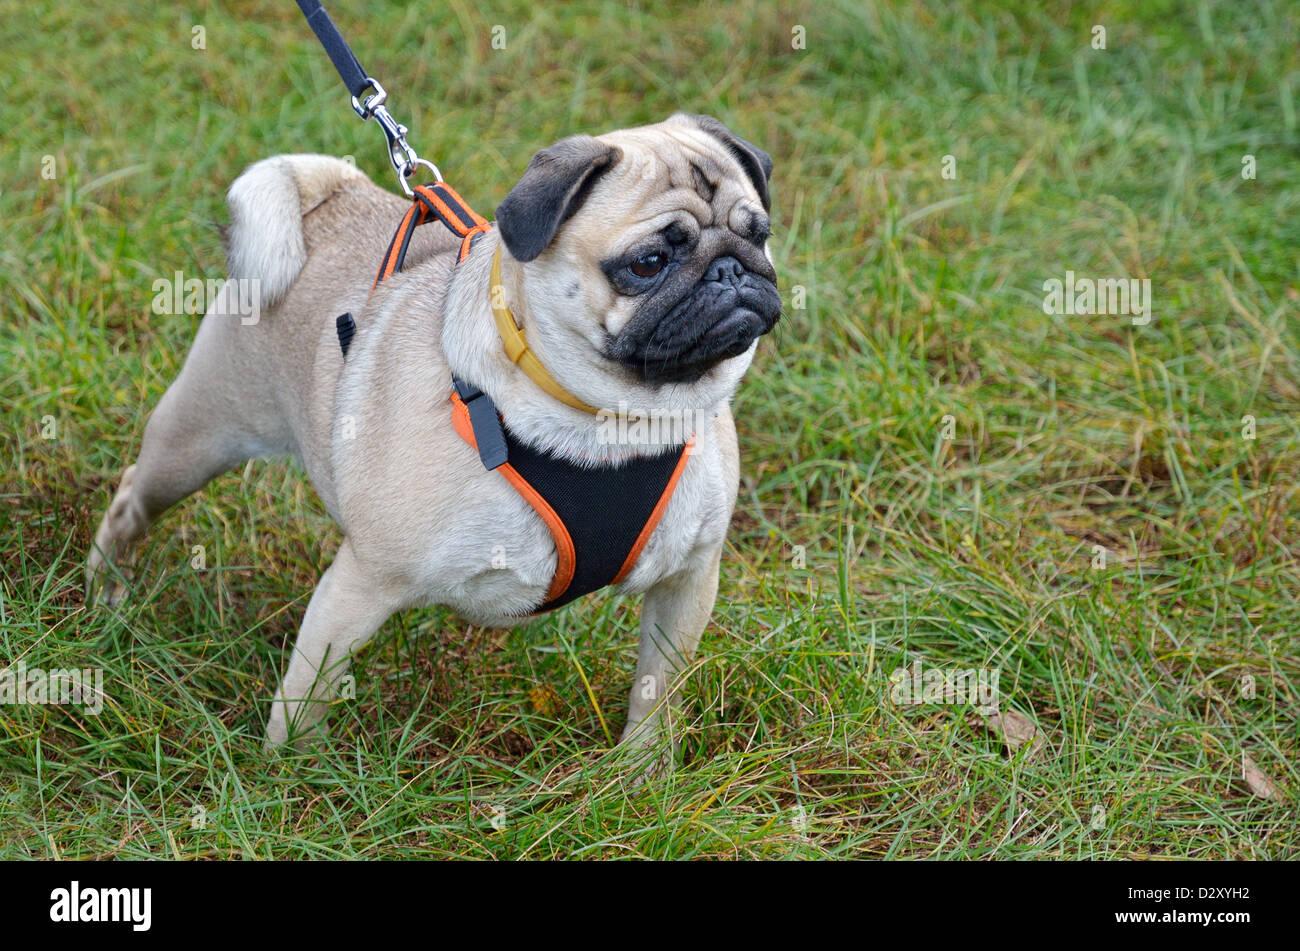 Pug on the leash - Stock Image